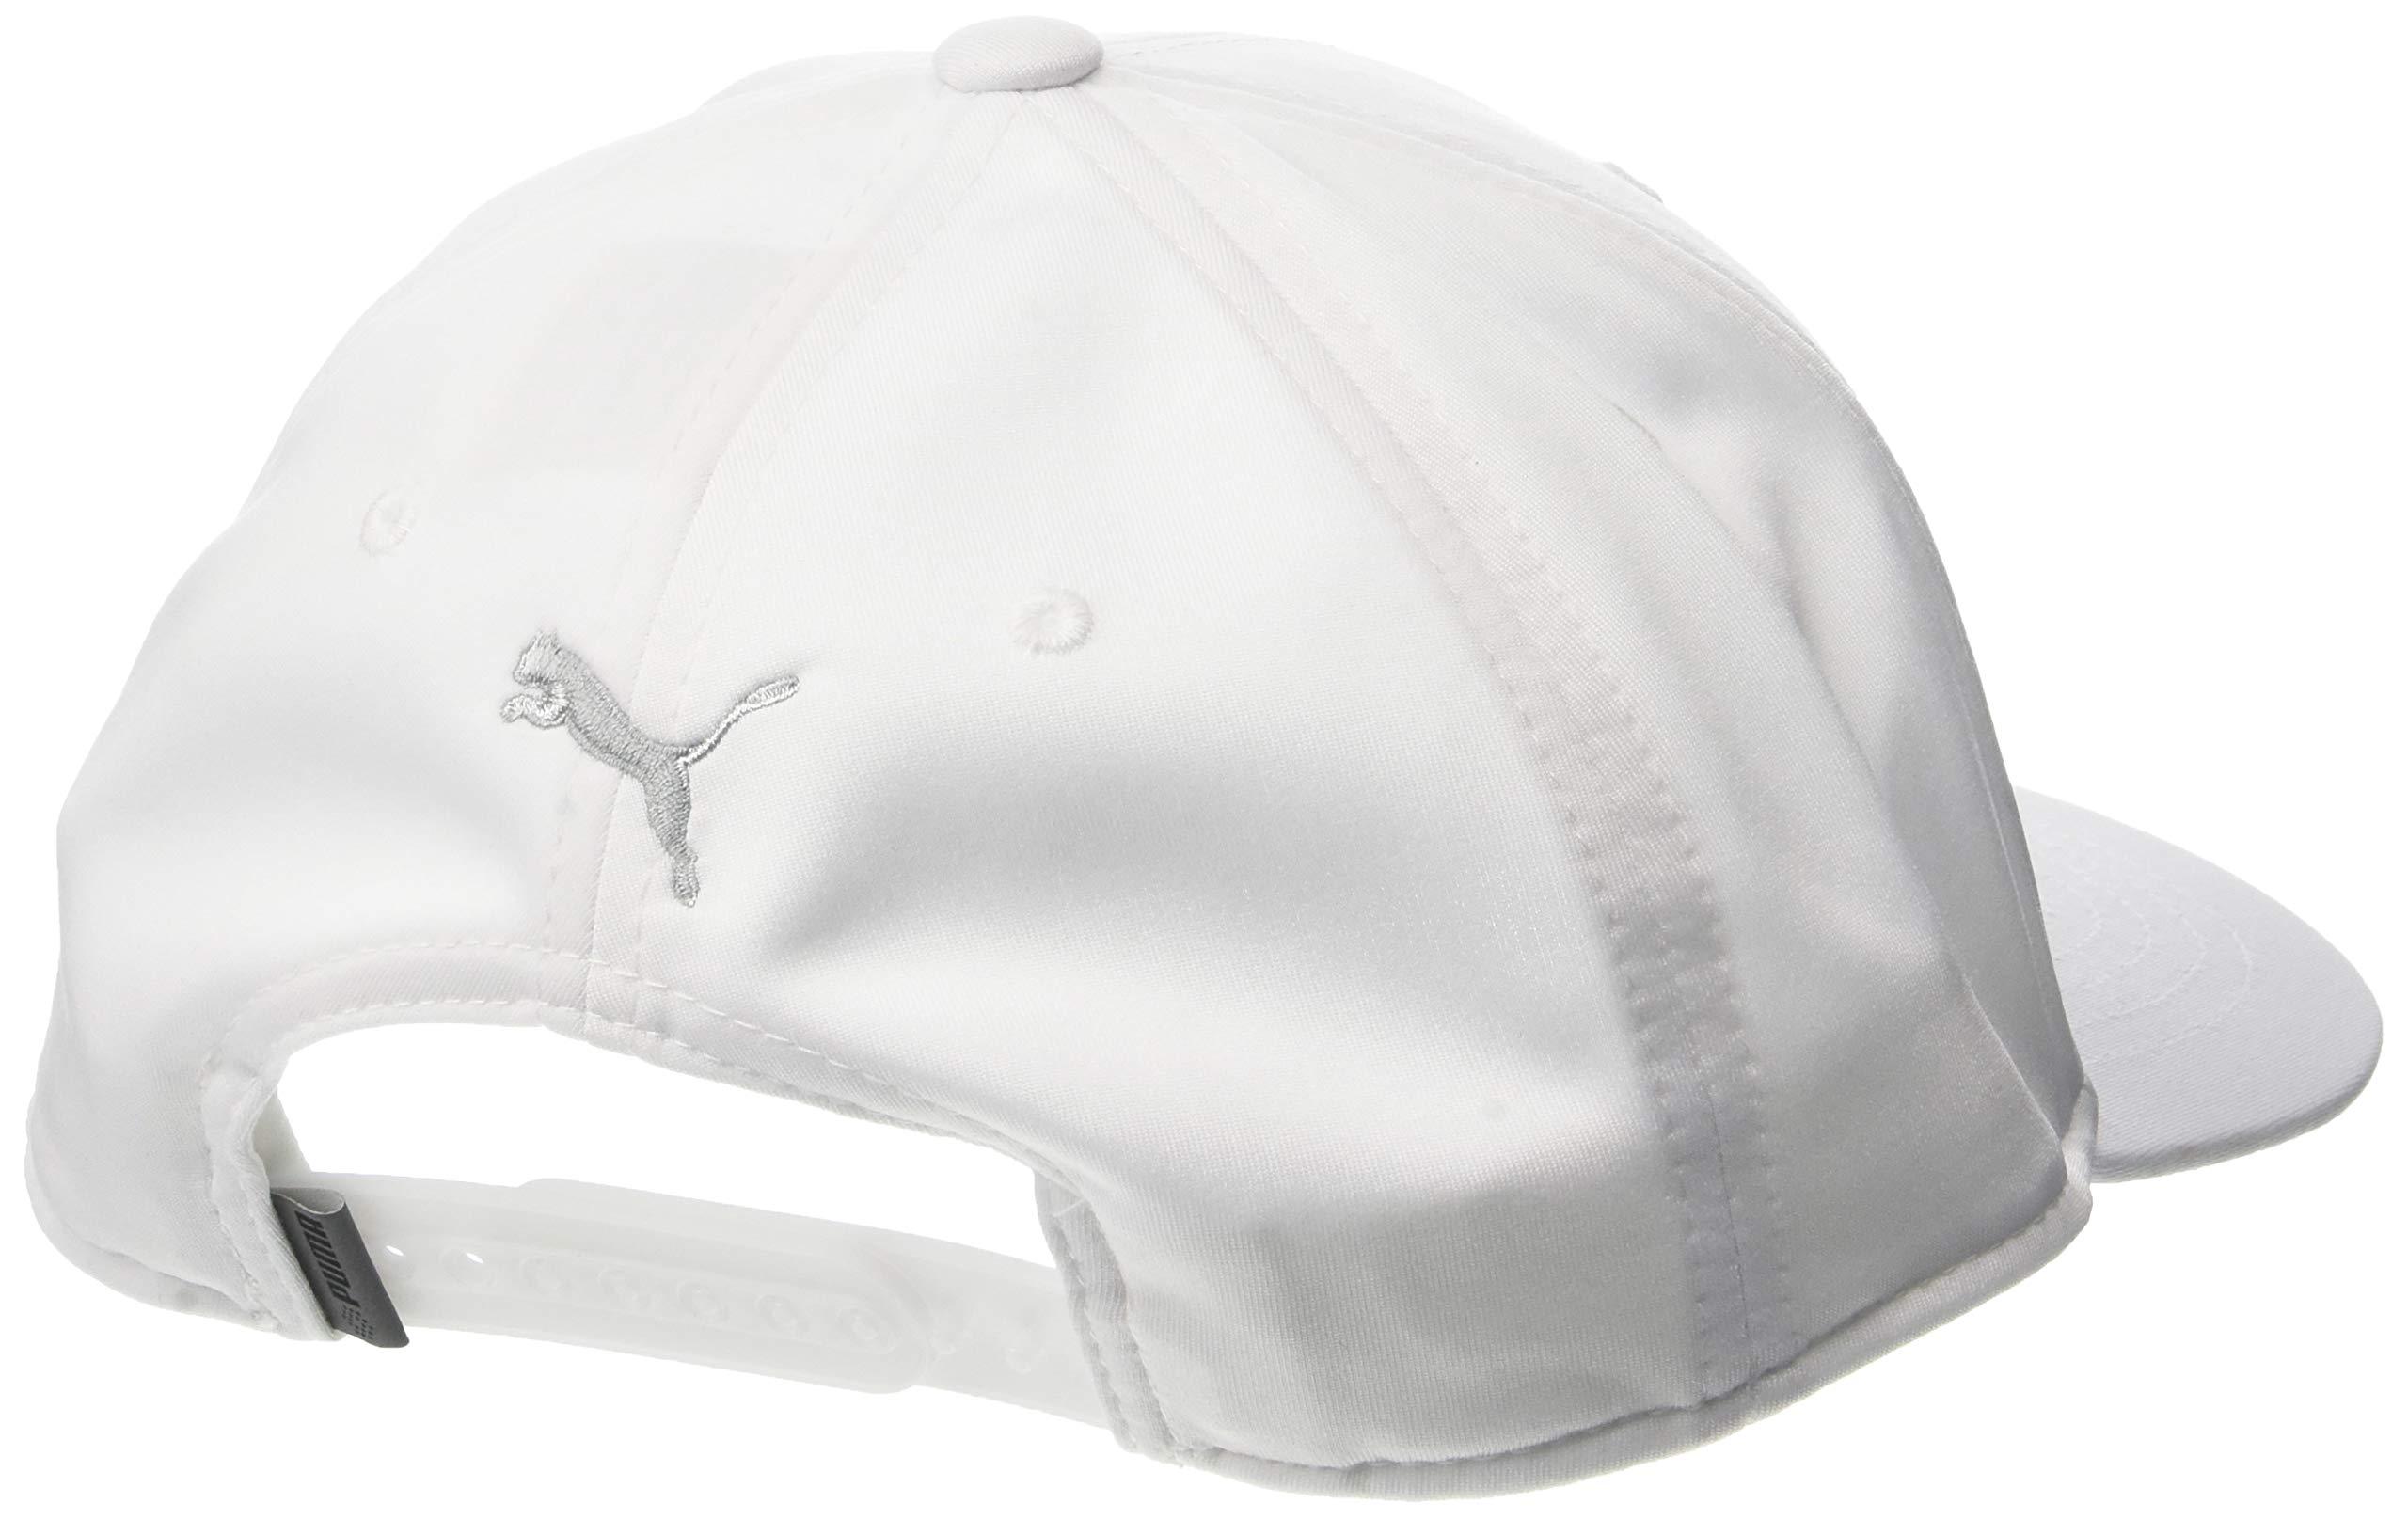 Puma Golf 2018 ''P'' Snapback Hat (Bright White Heather, One Size) Rickie Fowler P  Hat by PUMA (Image #2)